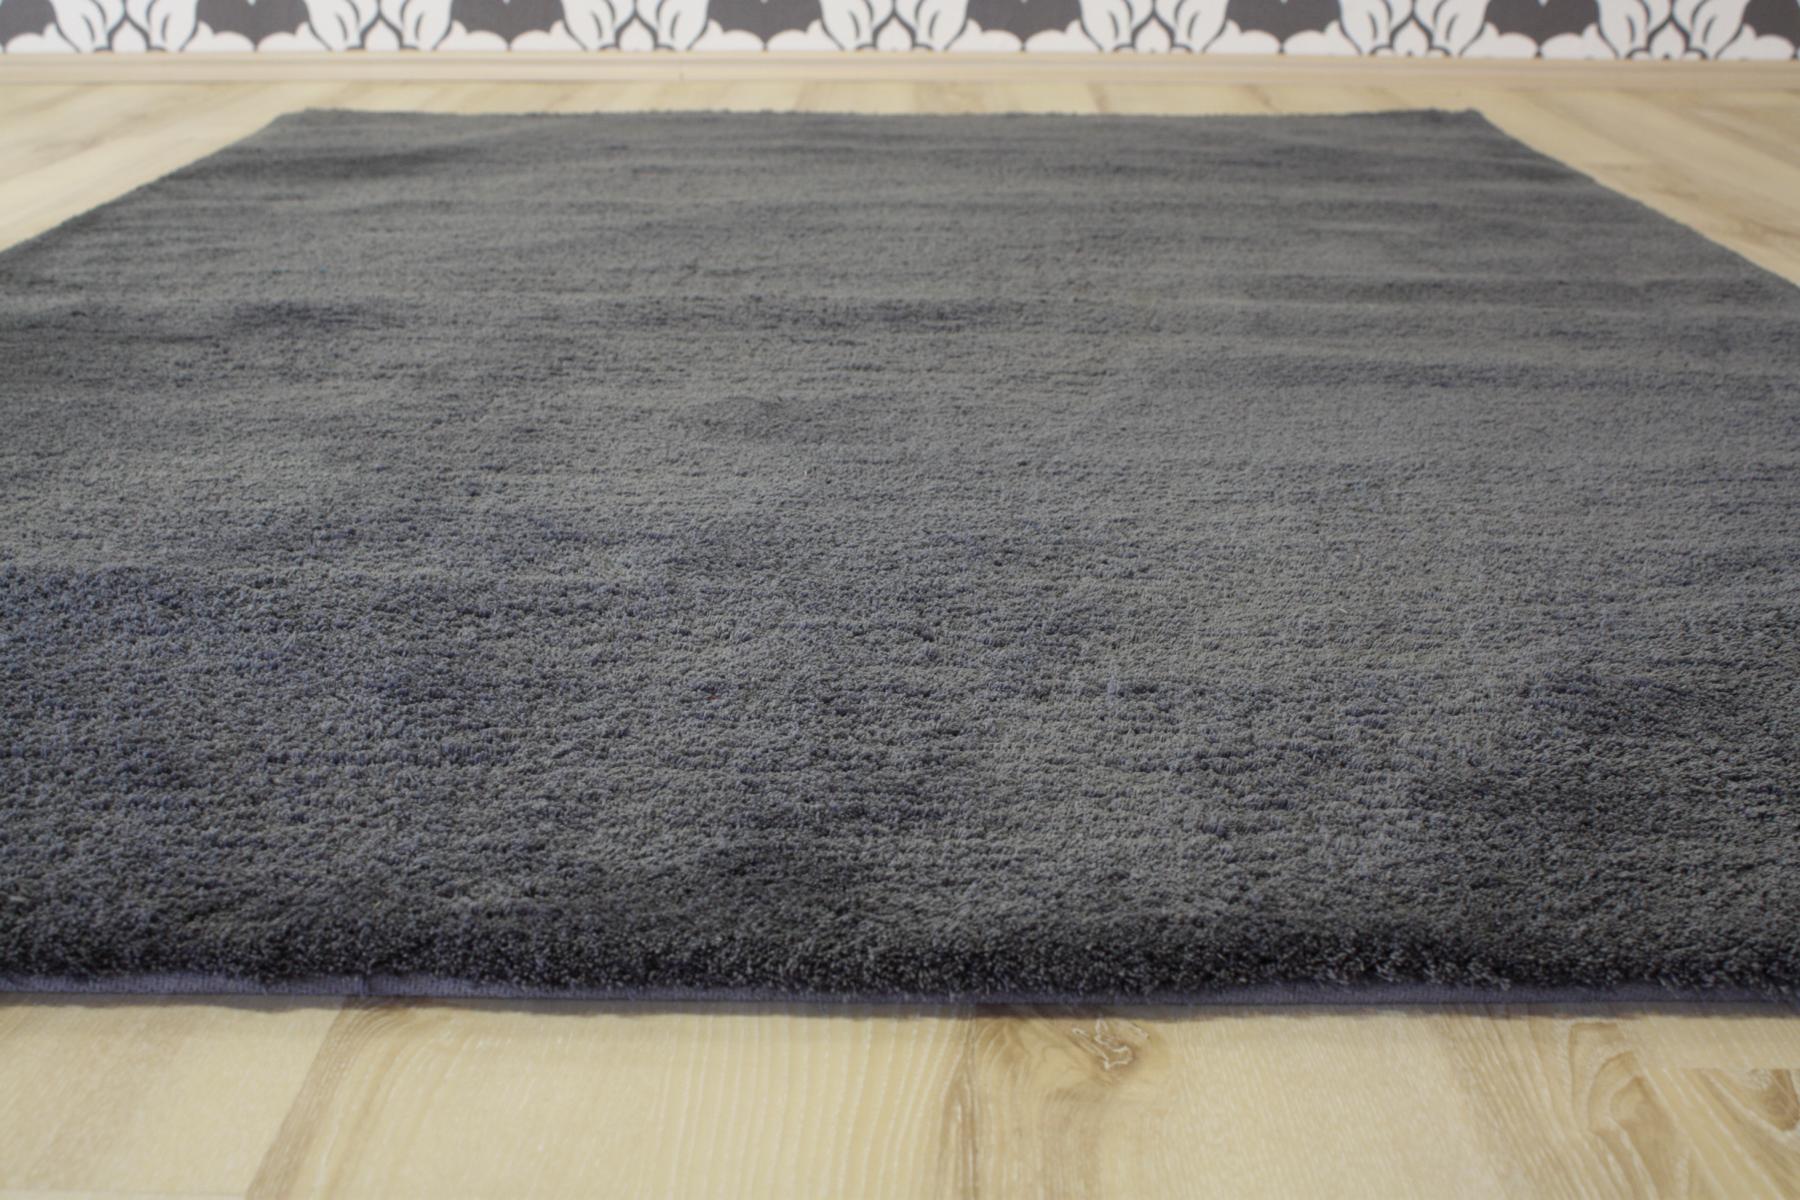 teppich langflor astra livorno 042 dunkel grau 140x200 cm weich ebay. Black Bedroom Furniture Sets. Home Design Ideas